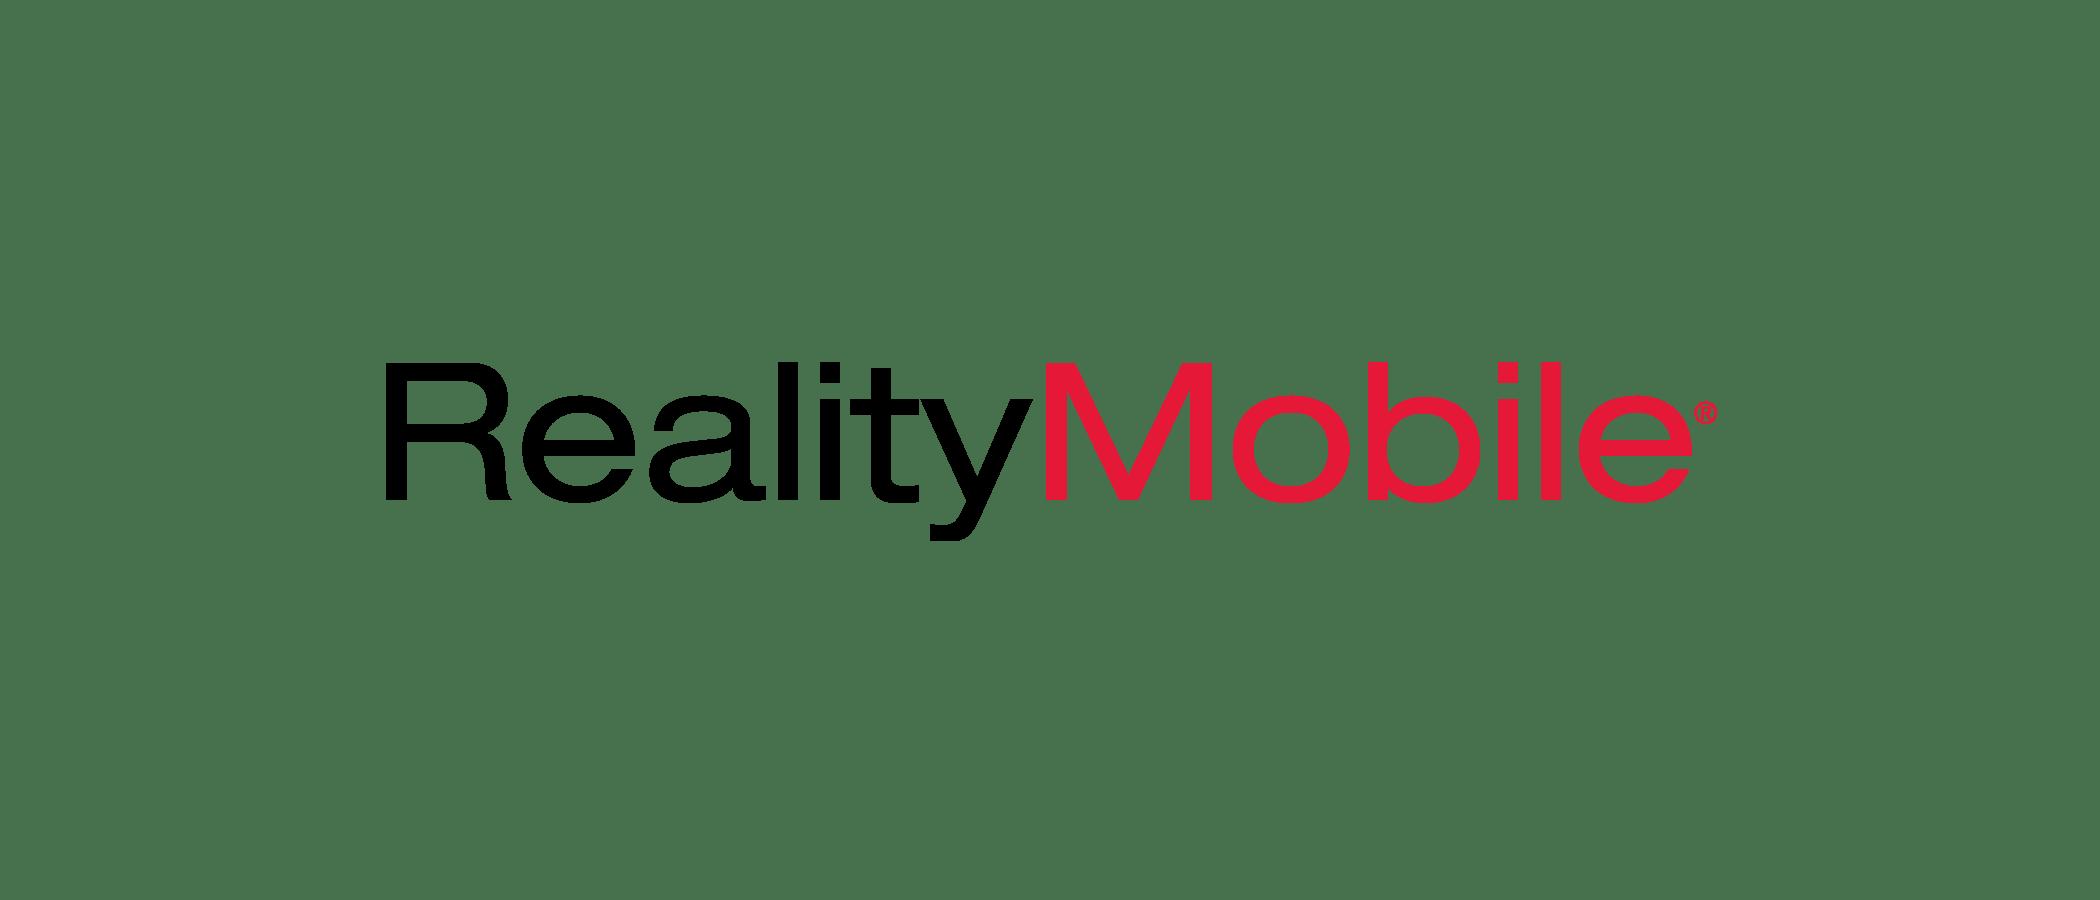 Reality Mobile company logo